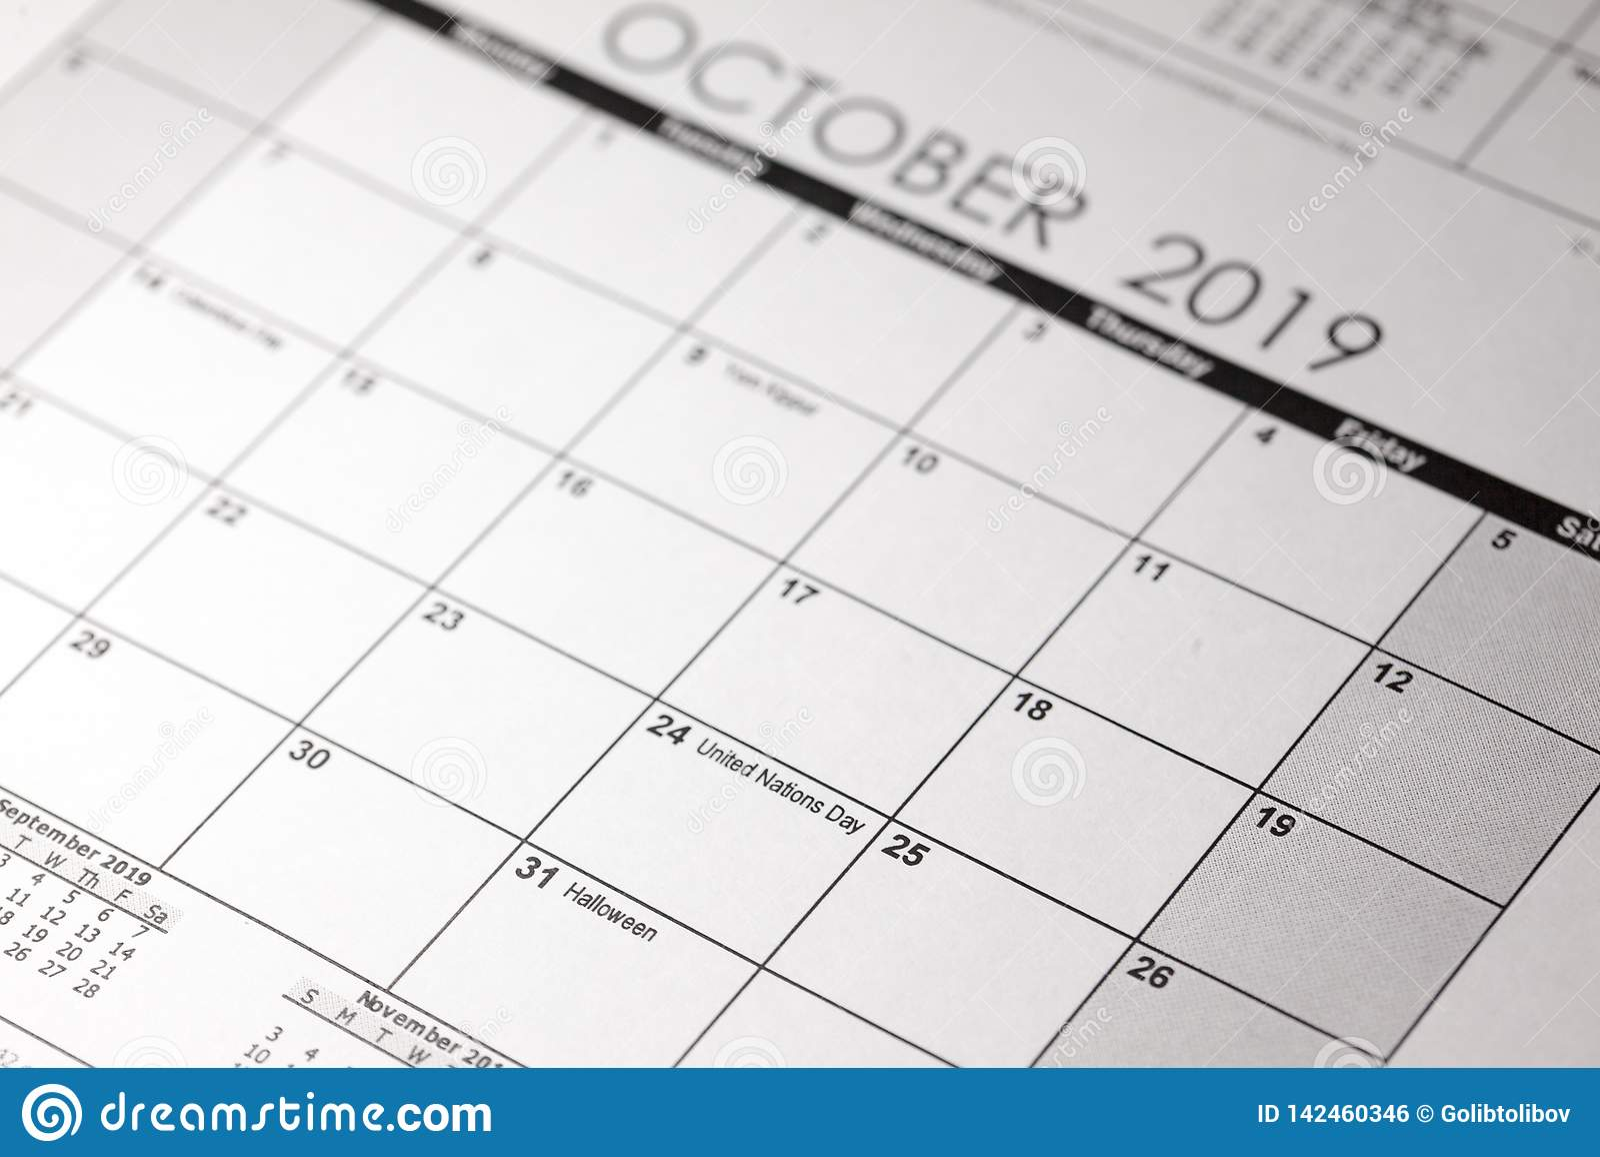 Calendrier de Halloween avec la date du 31 octobre